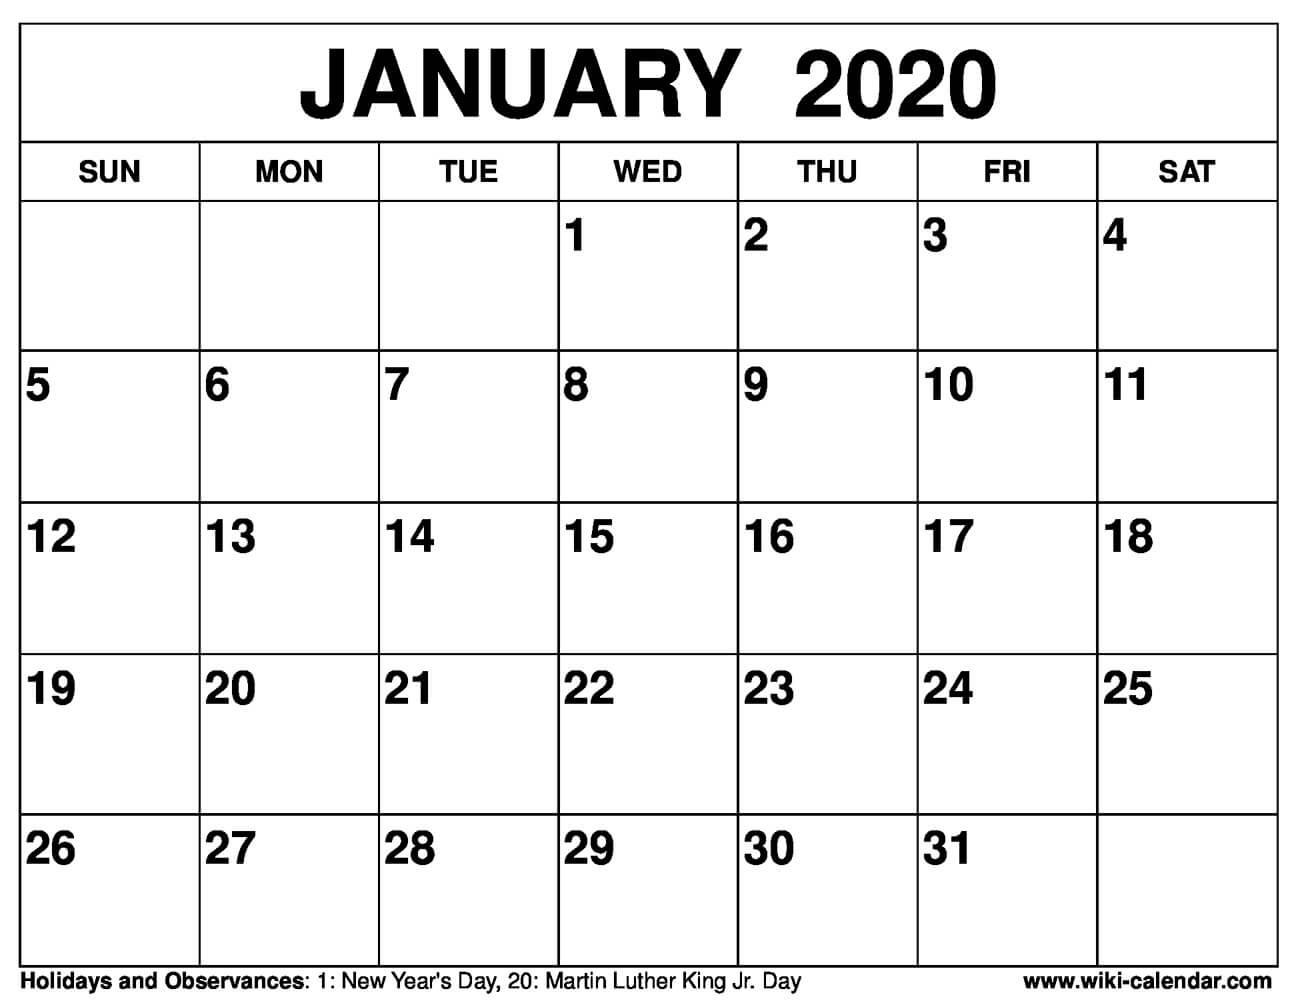 Free Printable January 2020 Calendar - Sharon Gore - Medium